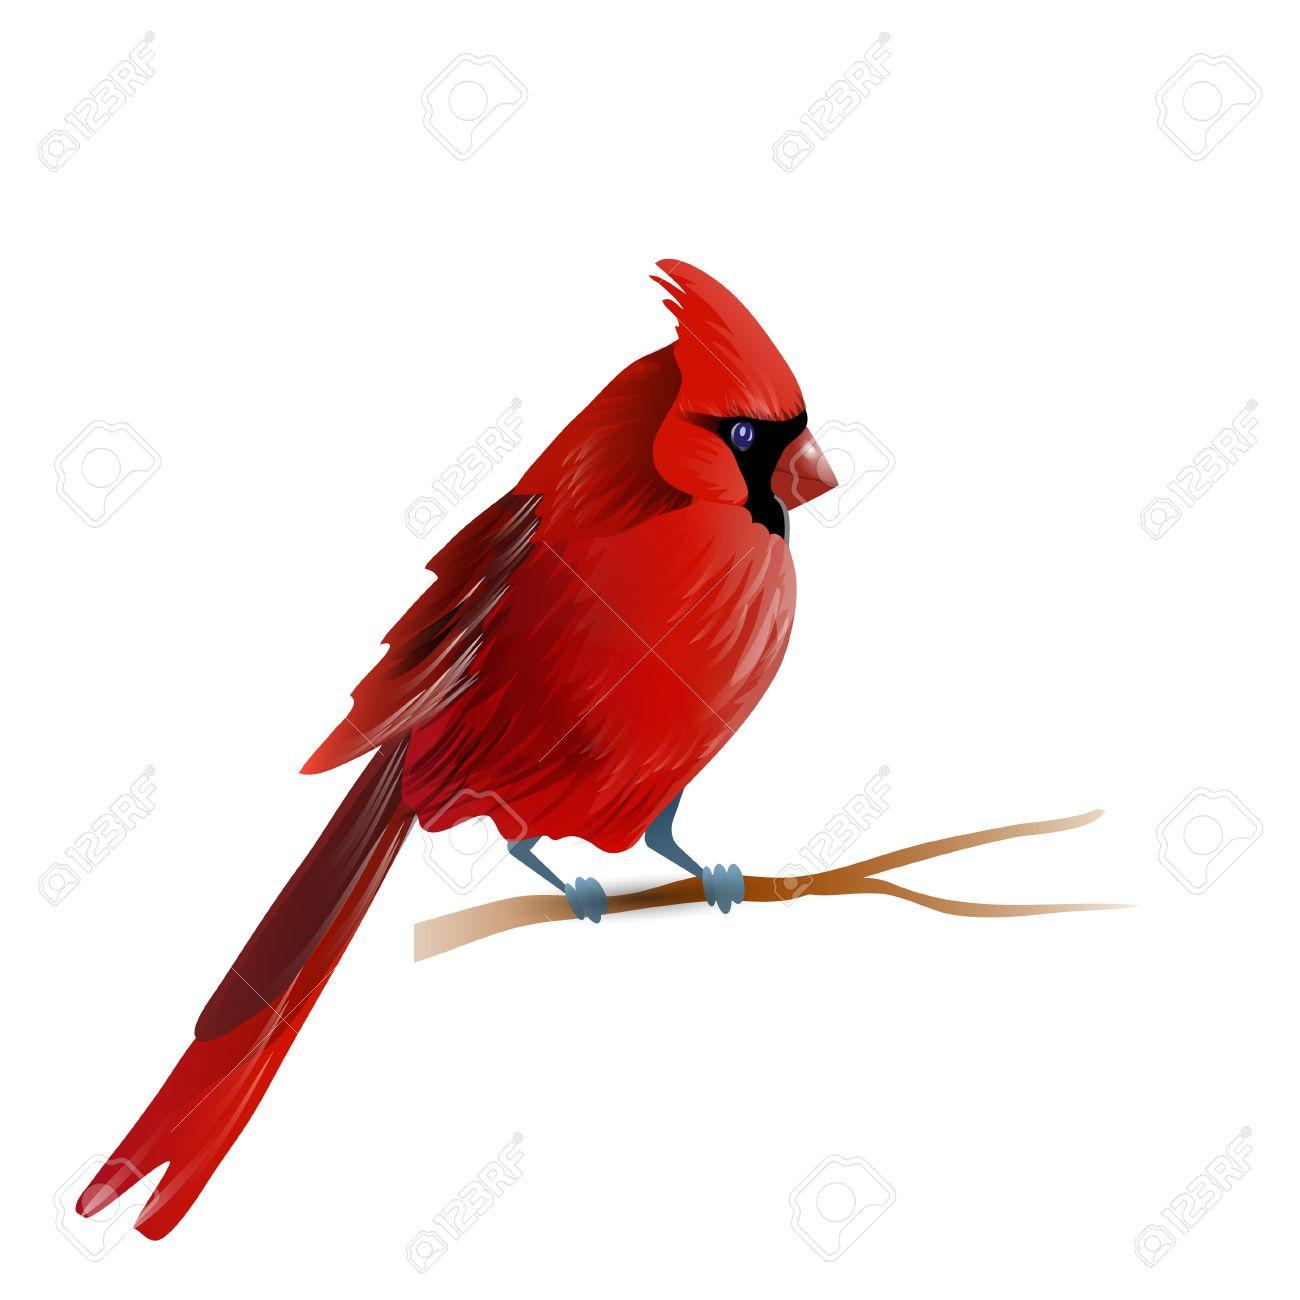 Cardinals Clipart Free & Free Clip Art Images #16873.